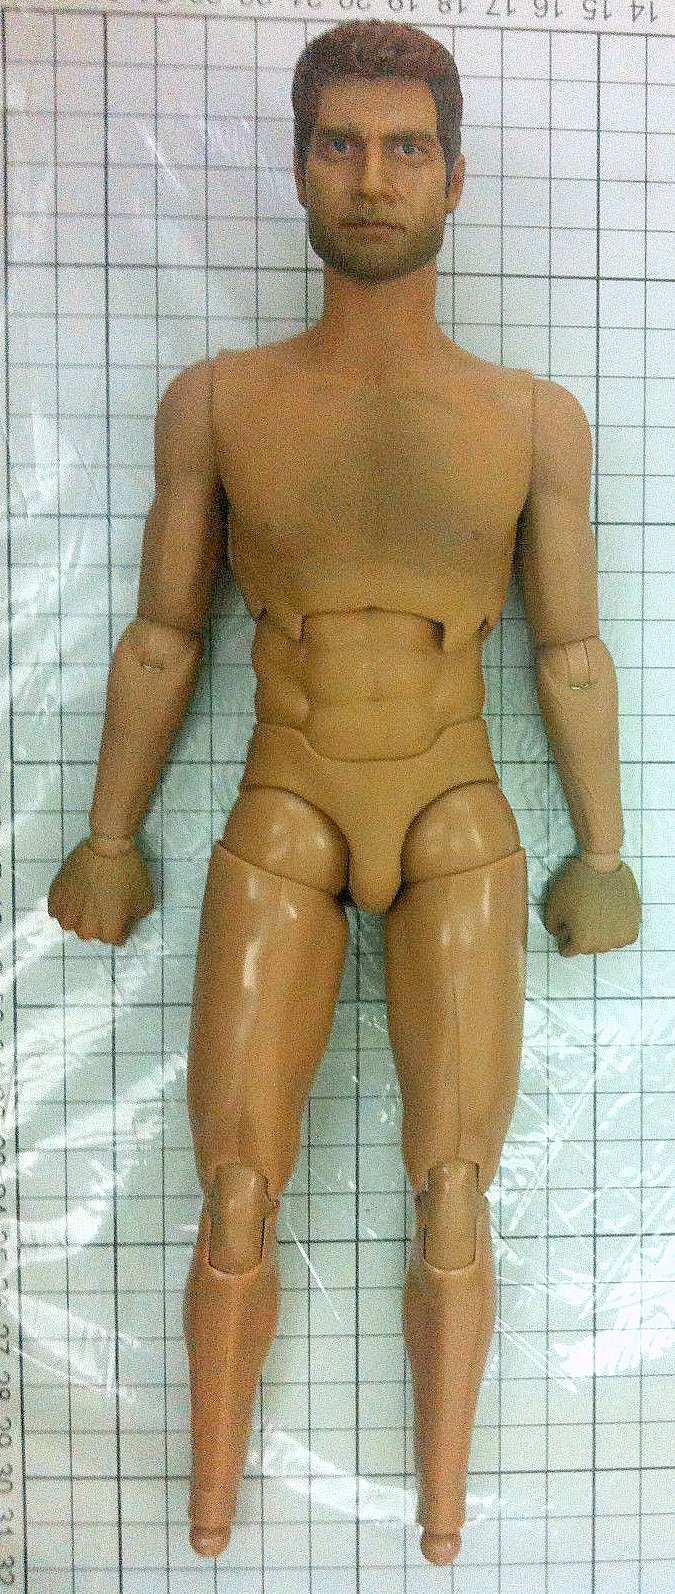 LE TEMPLE MAUDIT - INDIANA JONES Body11